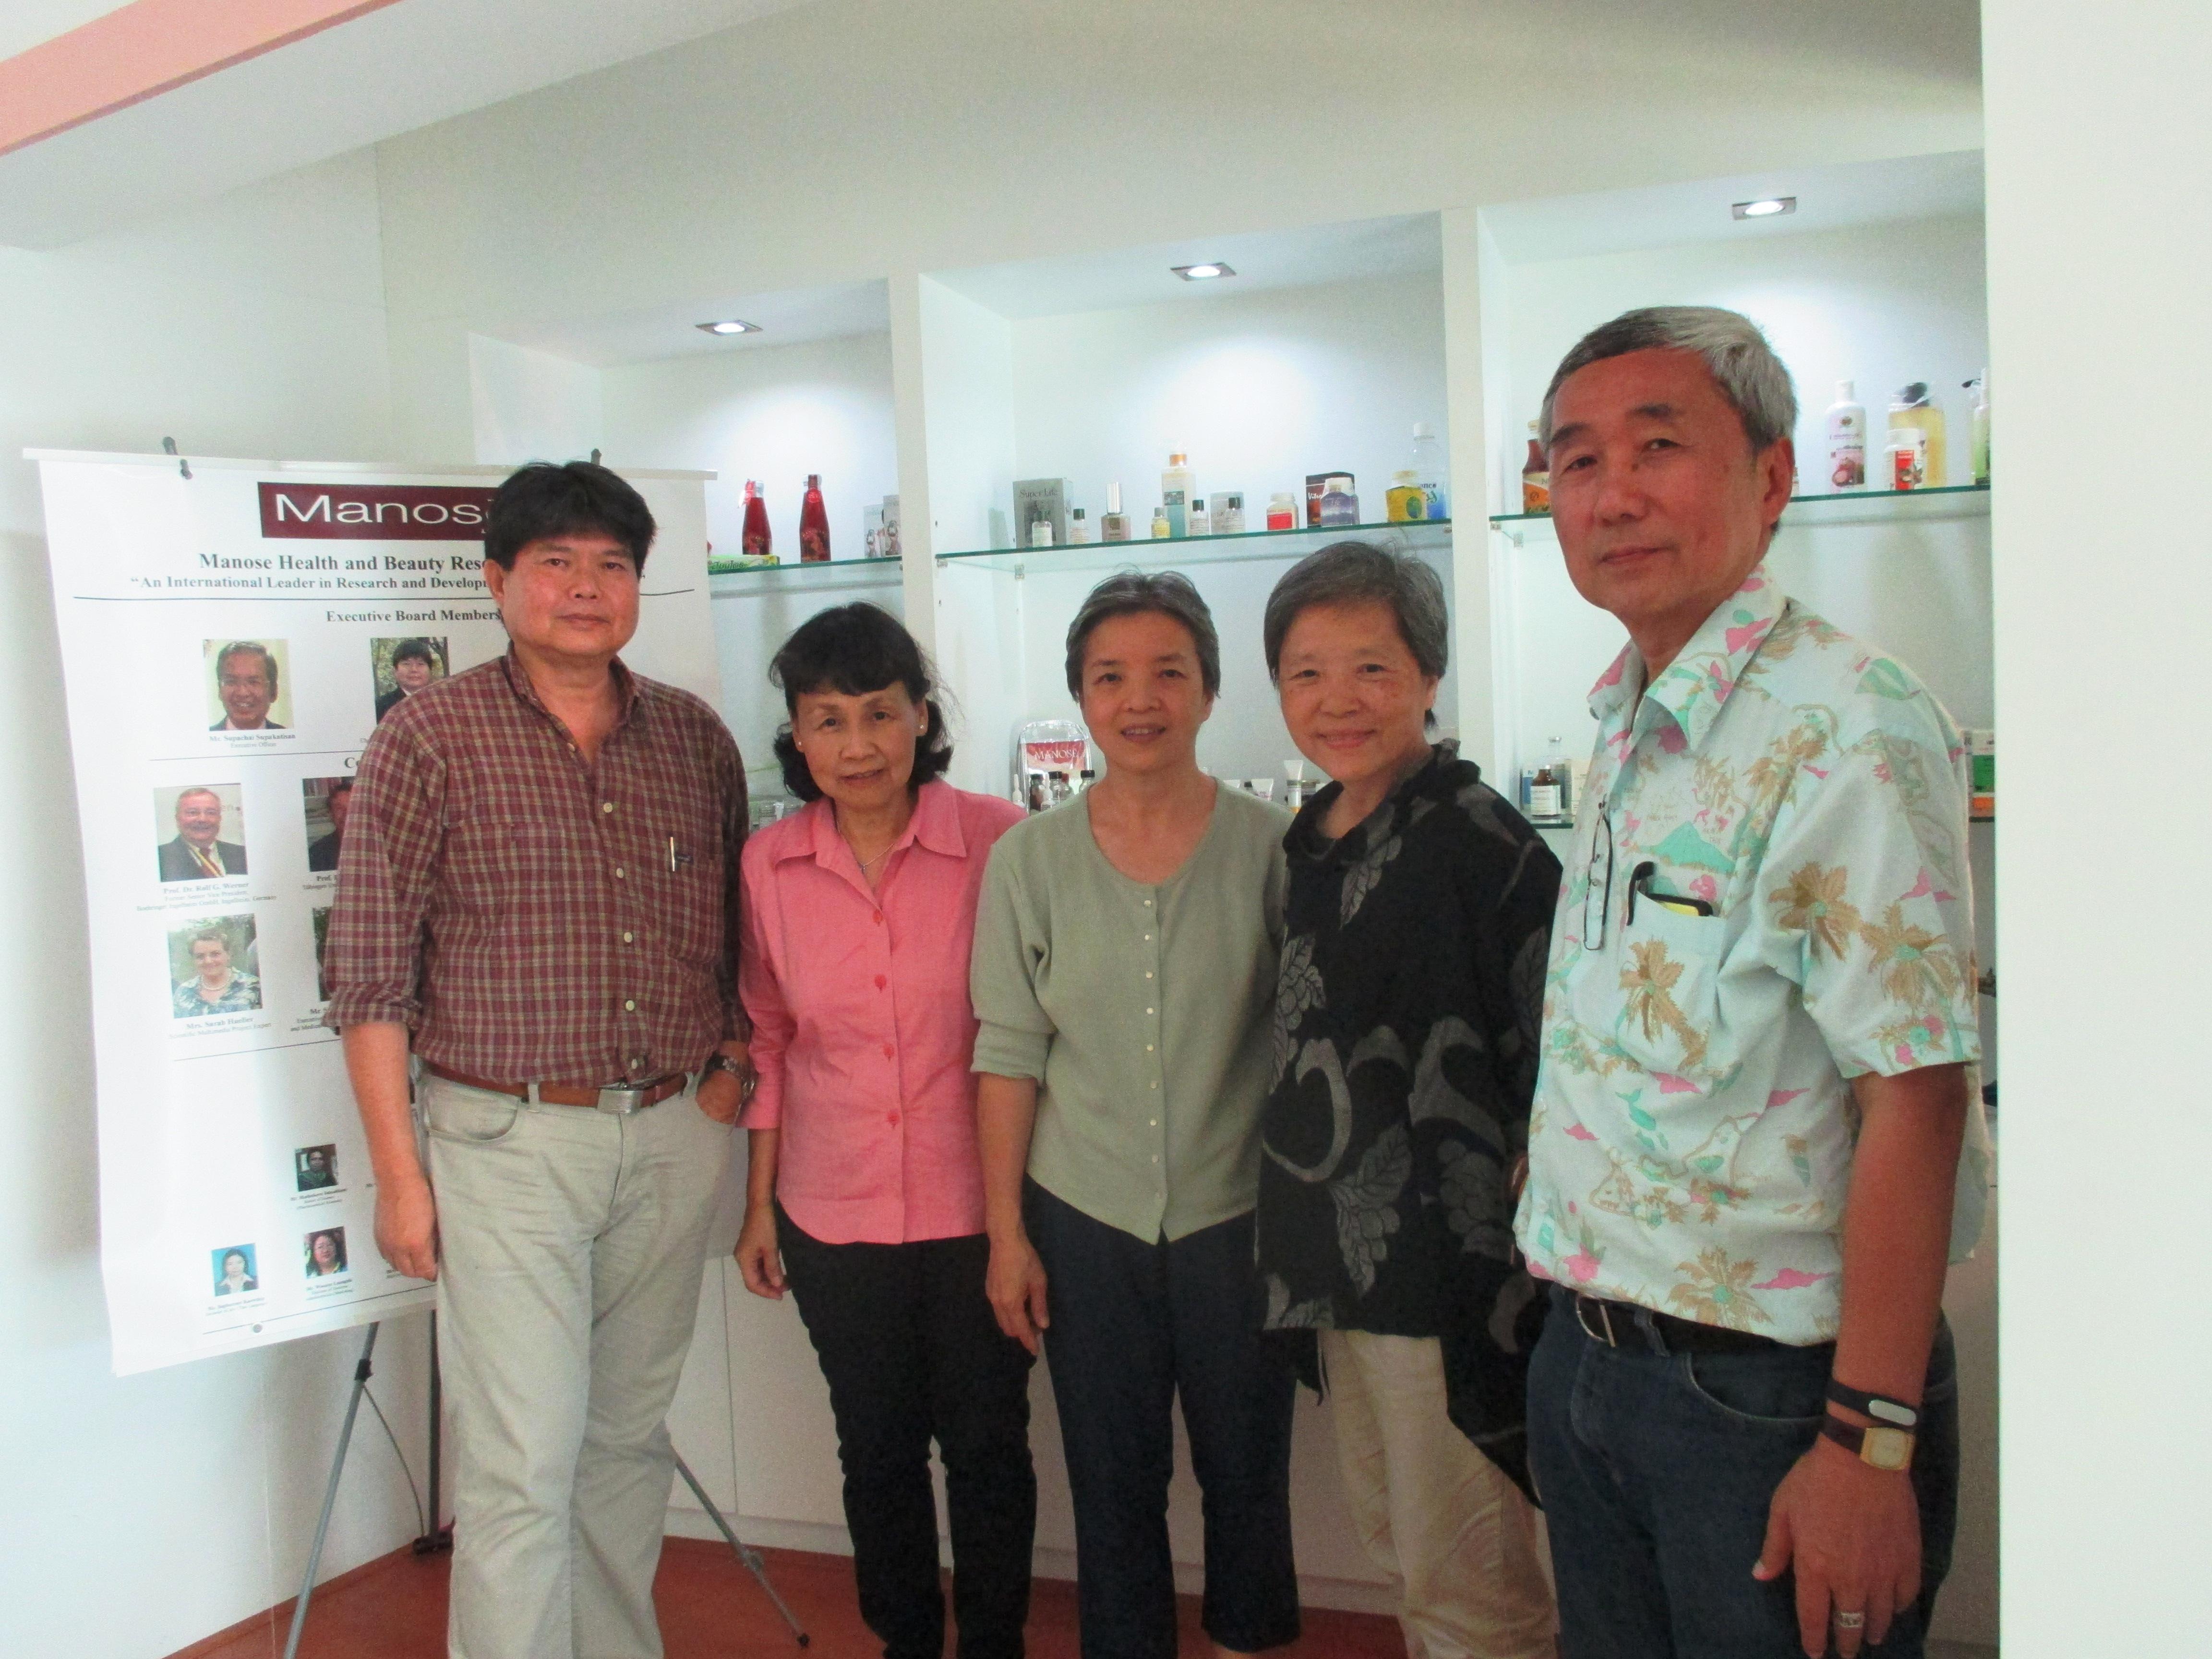 Mrs. Kanchana Vathanakuljarus, Mr. Sumonchai Pasavekin and Mrs. Ratana Pasavekin visited Manose Health and Beauty Research Center